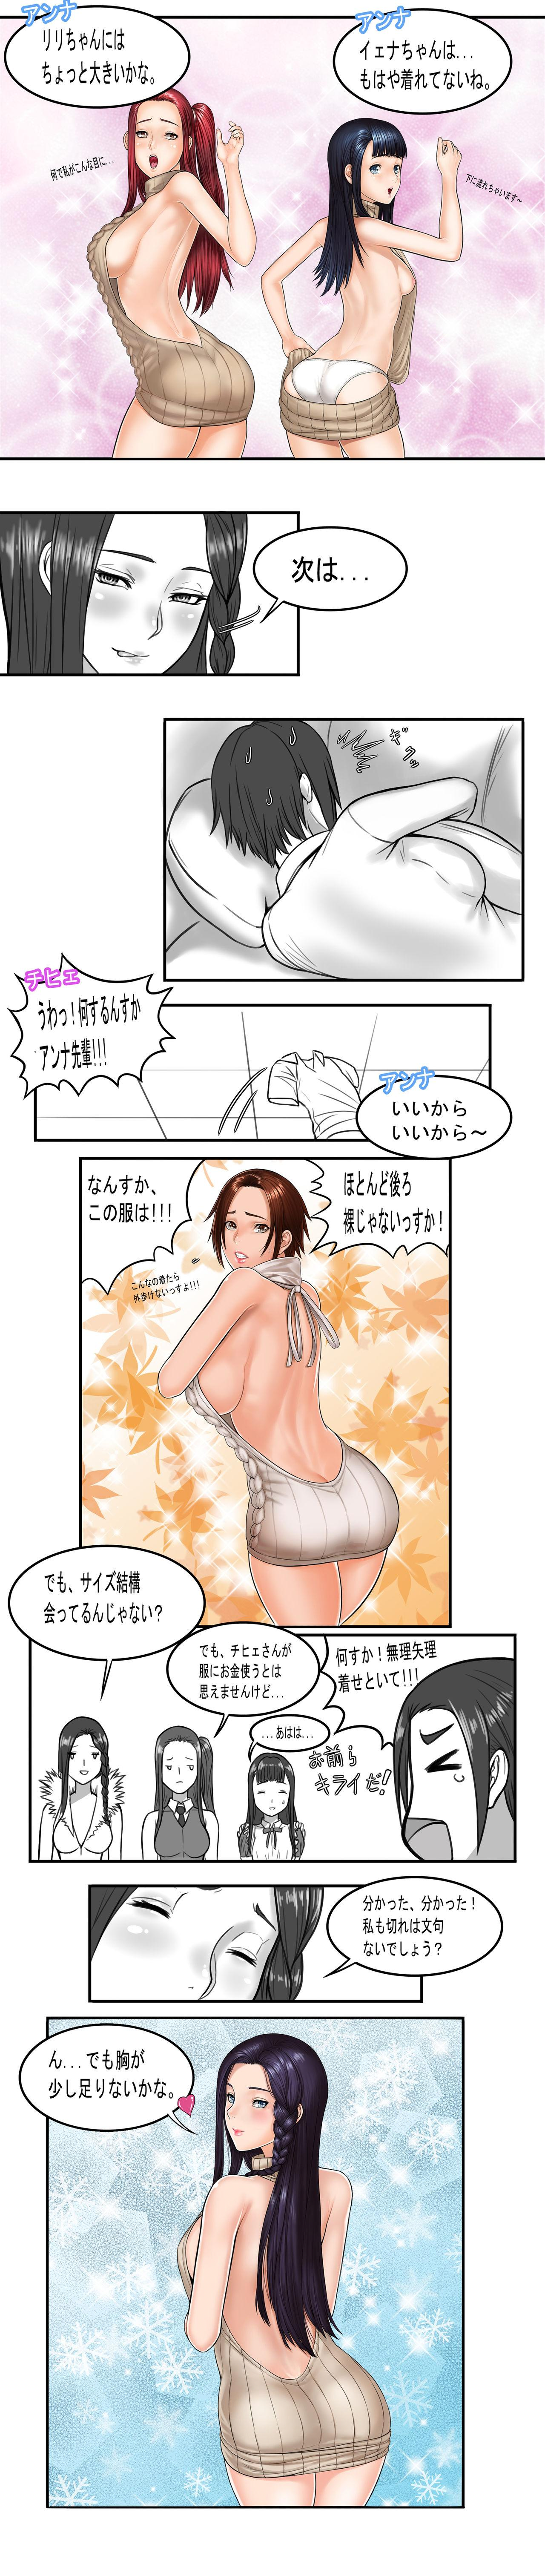 Sunshine Pro no Ichinichi 3